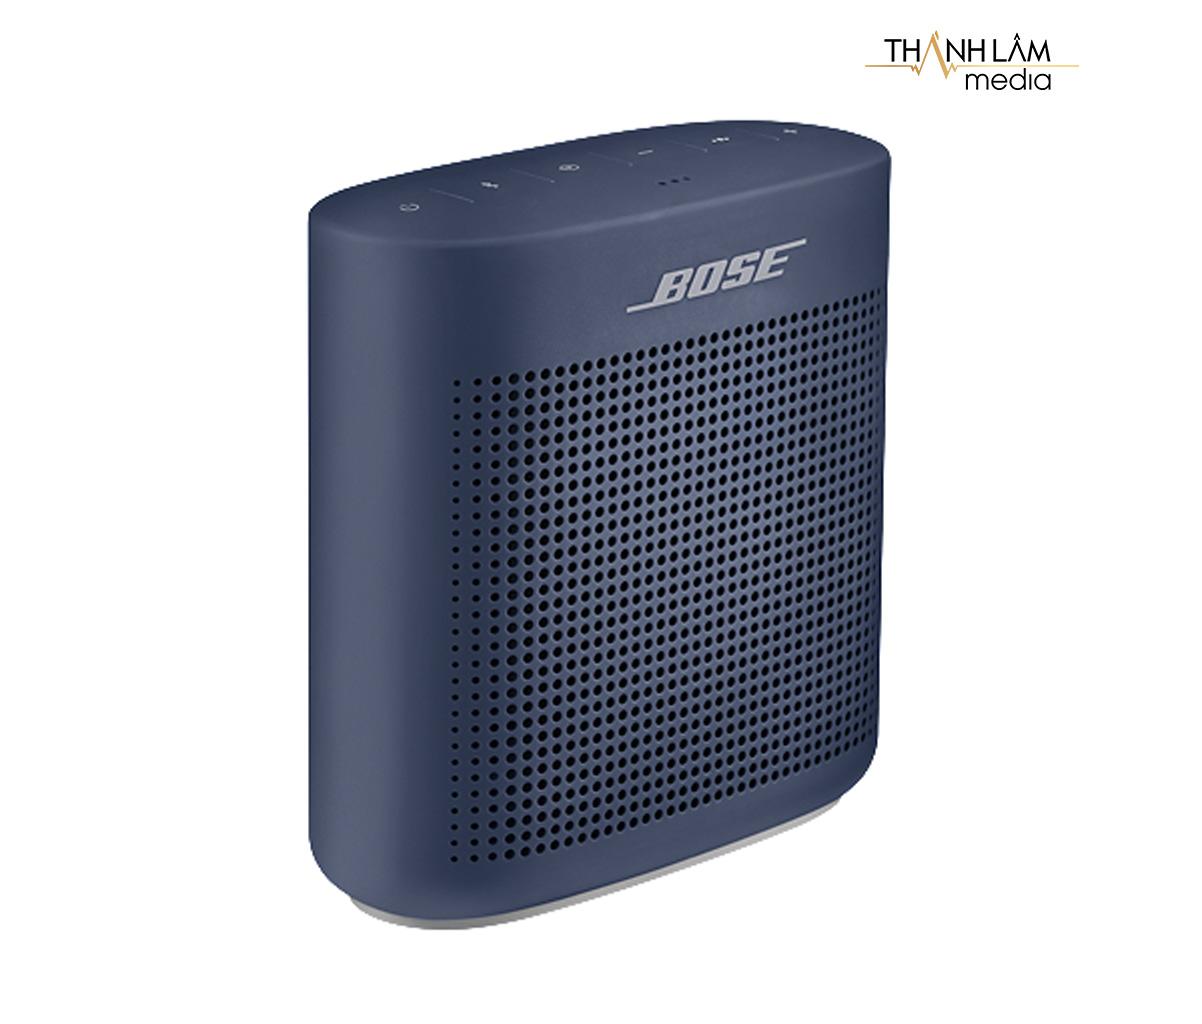 Loa-Bose-SoundLink-Color-2-Xanh-Tim-Than-1